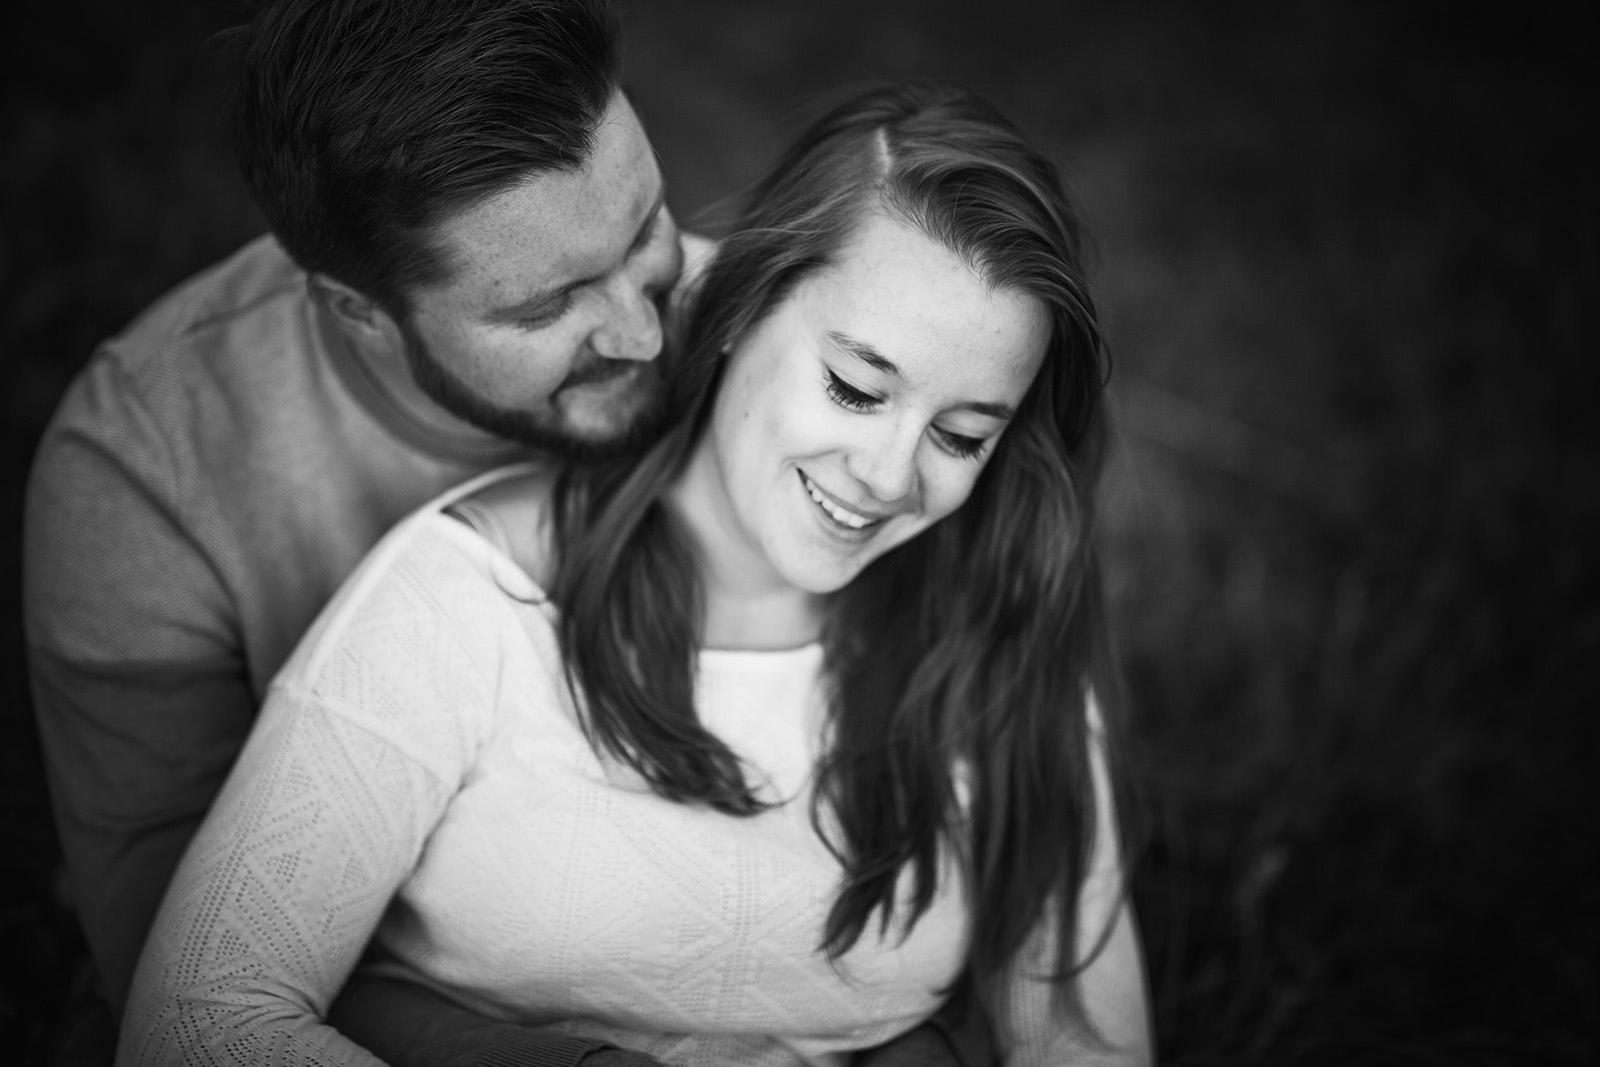 seance-photo-couple-engagement-grenoble-isere-montagne-chartreuse-vercors-elise-julliard-photographe-portrait-13